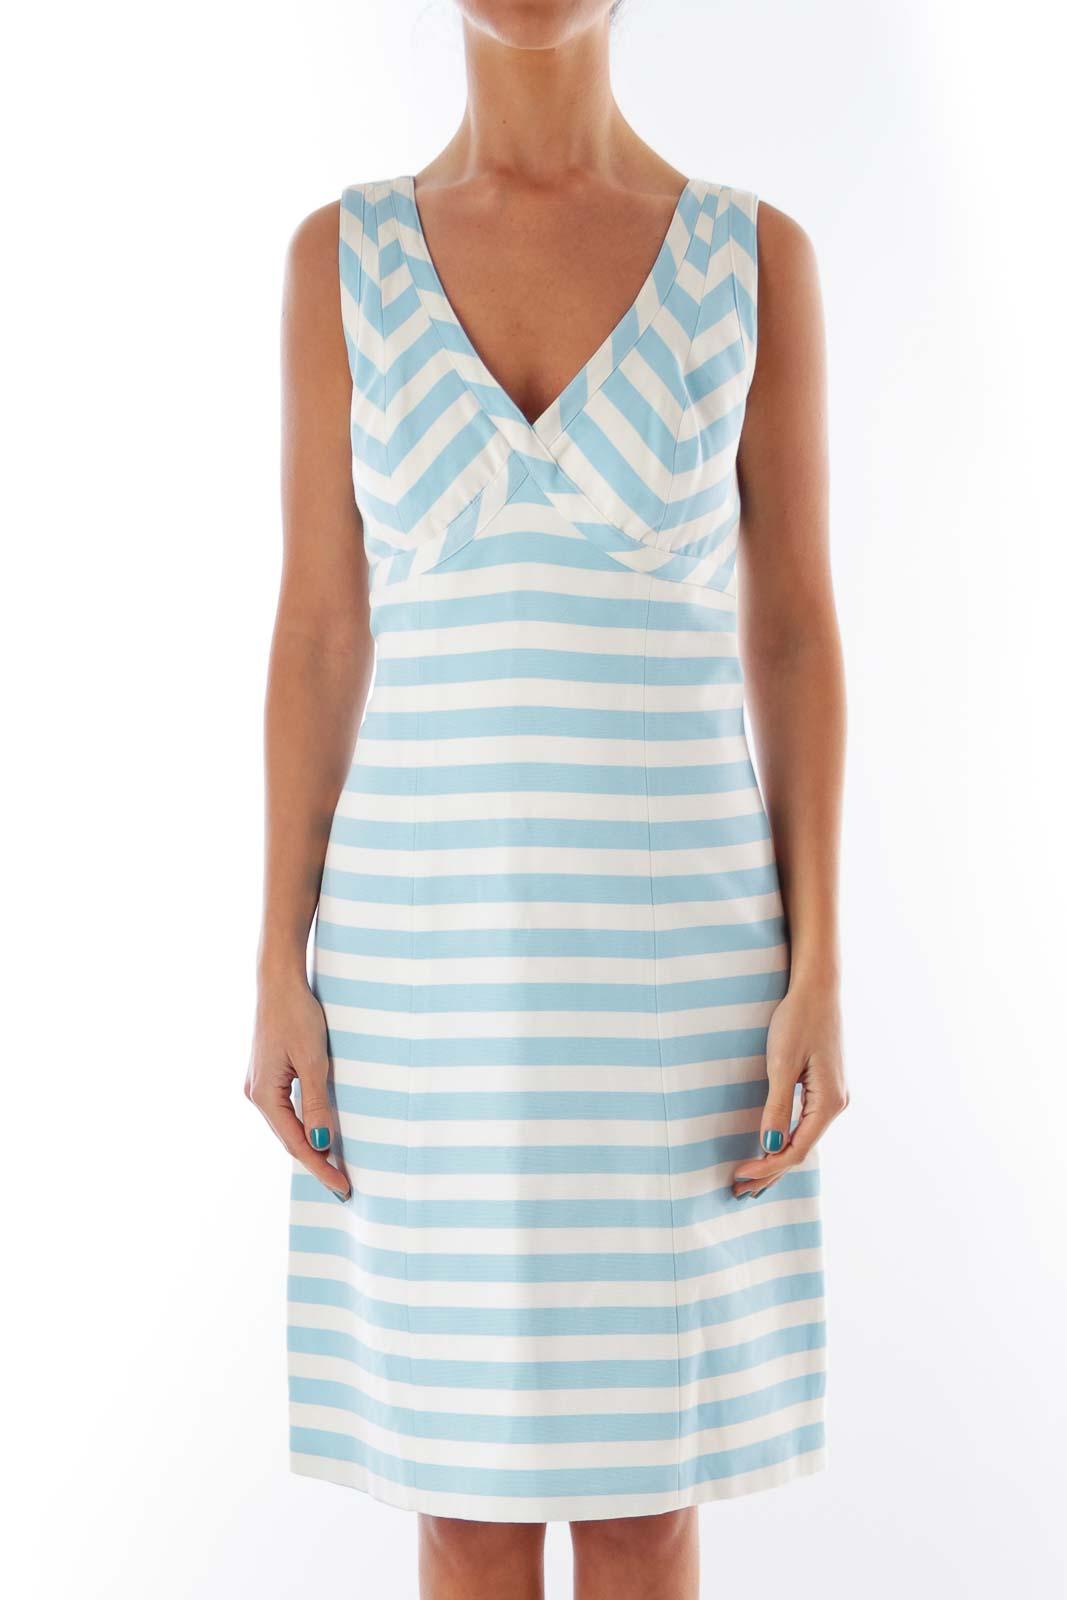 White & Blue Stripe Dress Front